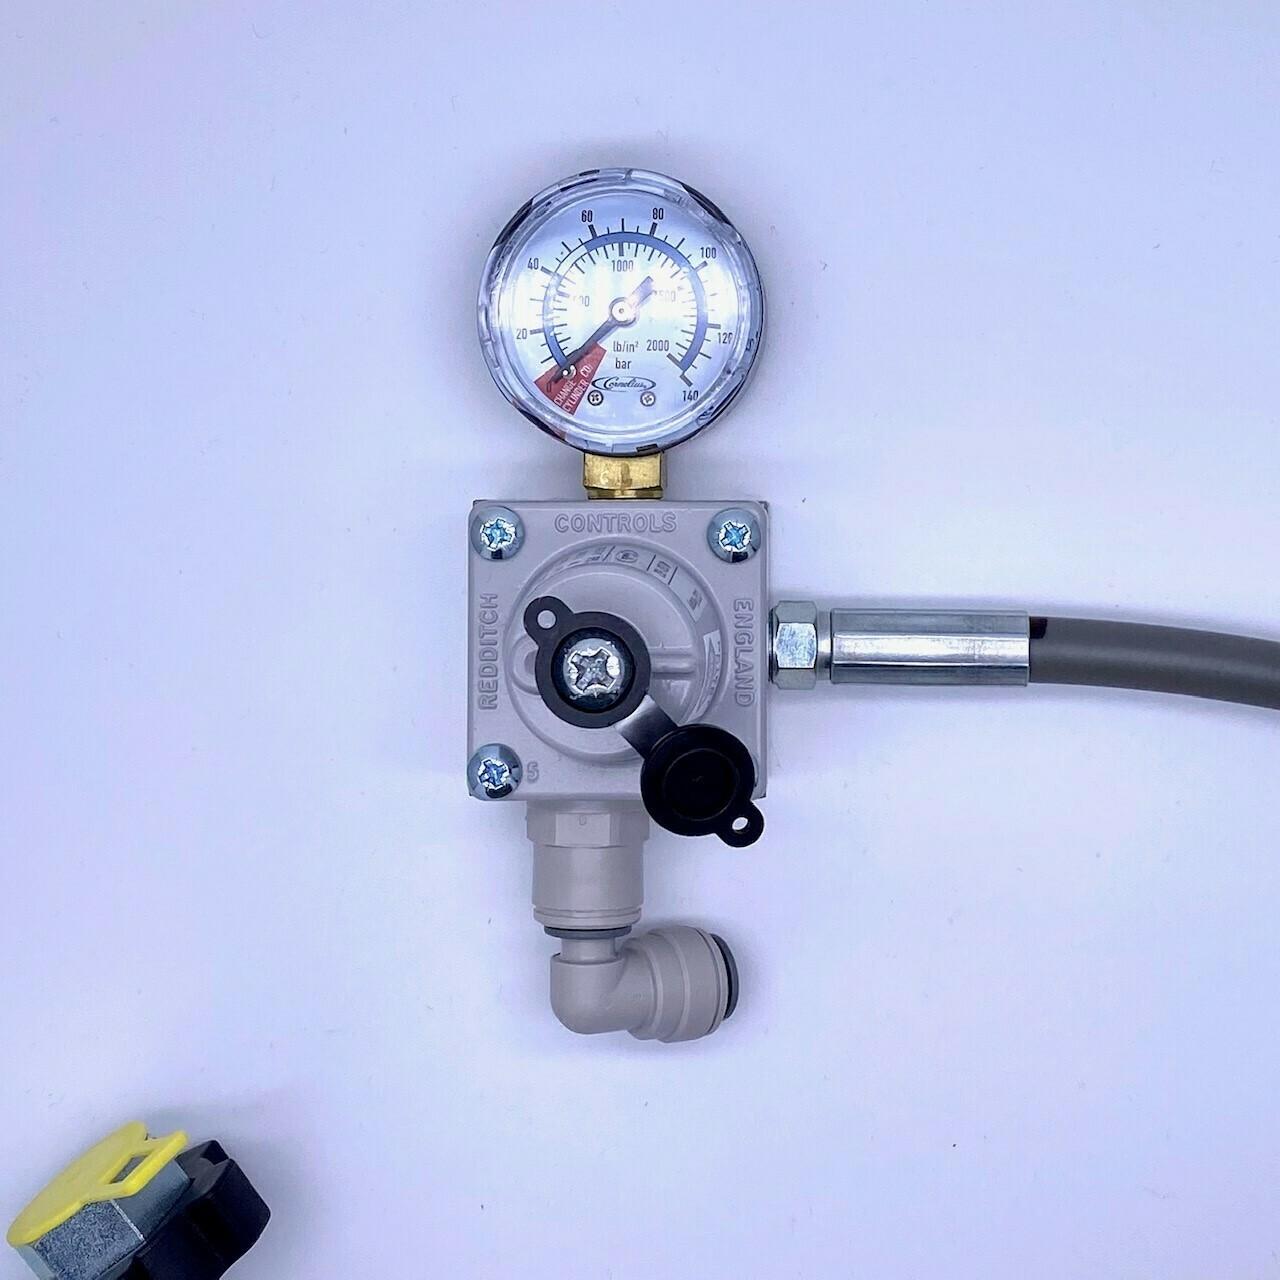 CO2 gas regulator